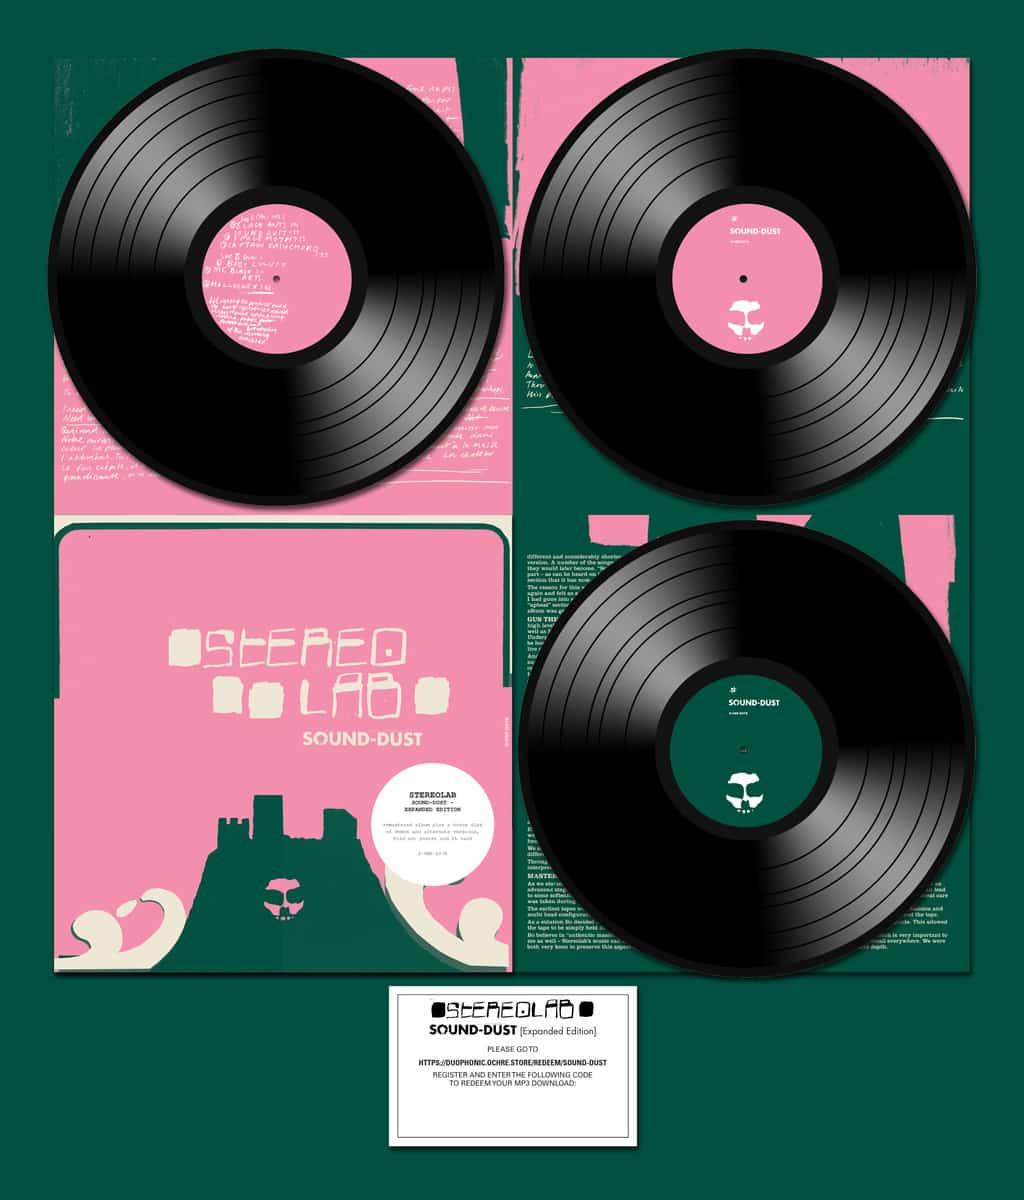 Stereolab Sound Dust Vinyl Lp Amp Cd Five Rise Records